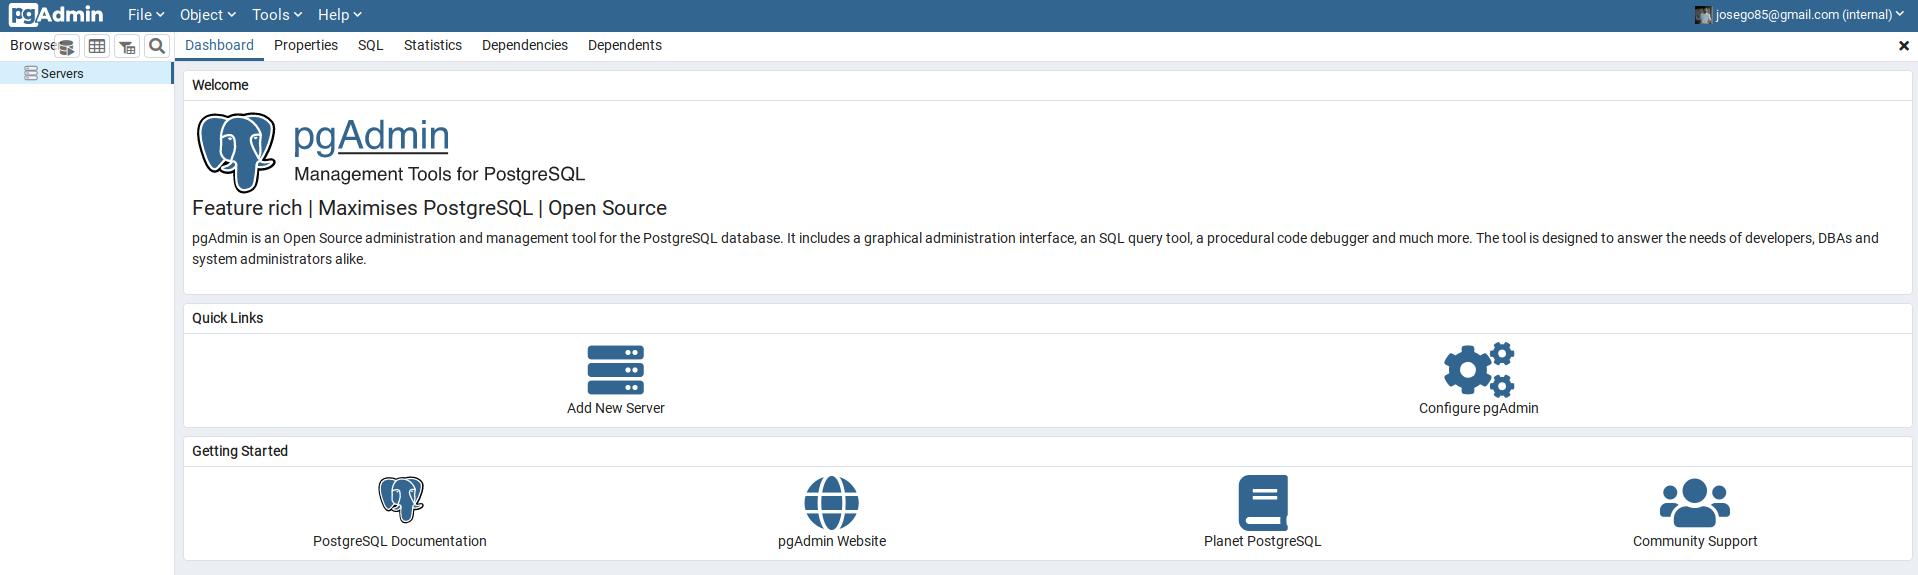 pgAdmin4 Ubuntu 20.04 LTS